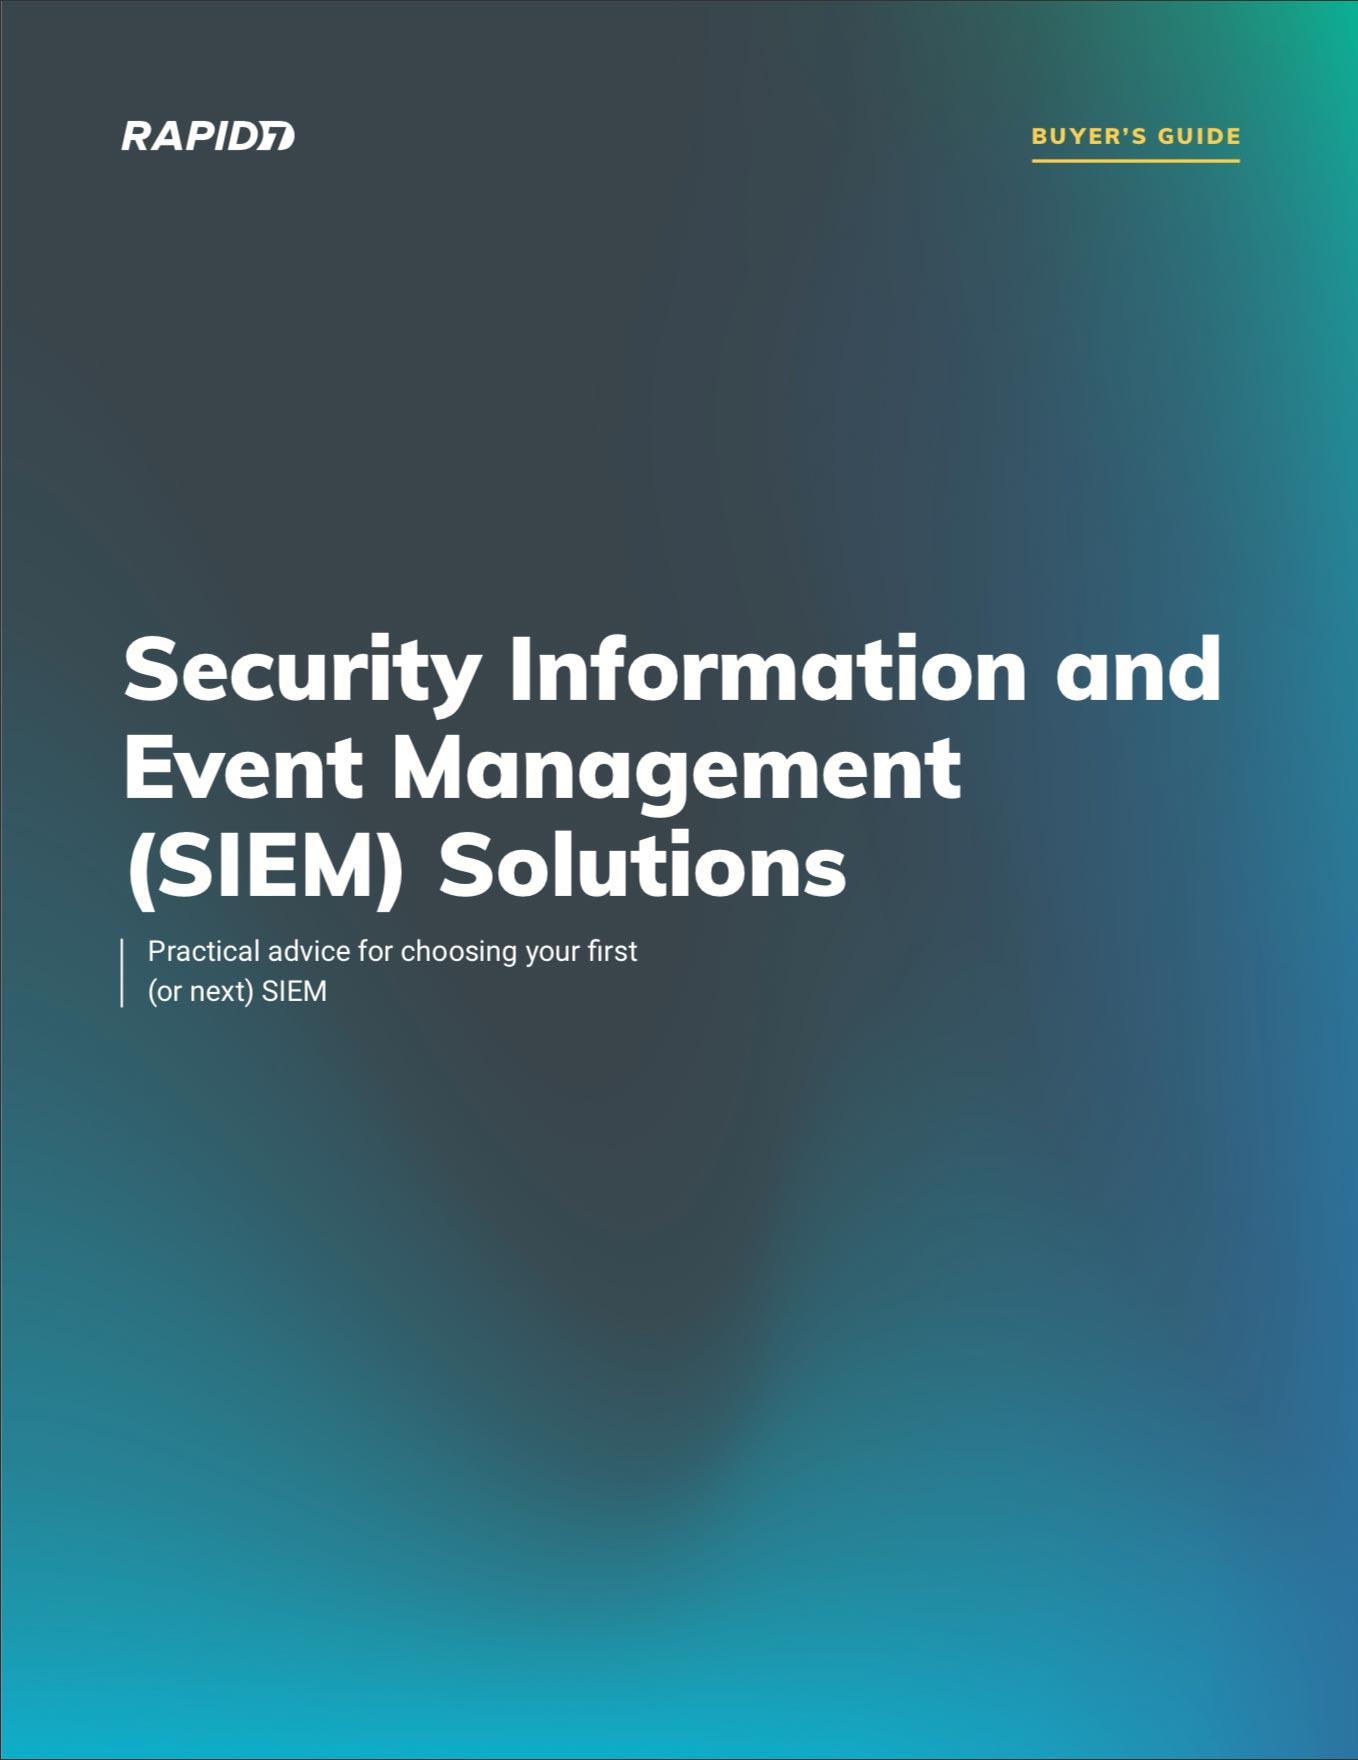 Rapid7 SIEM Buyer's Guide